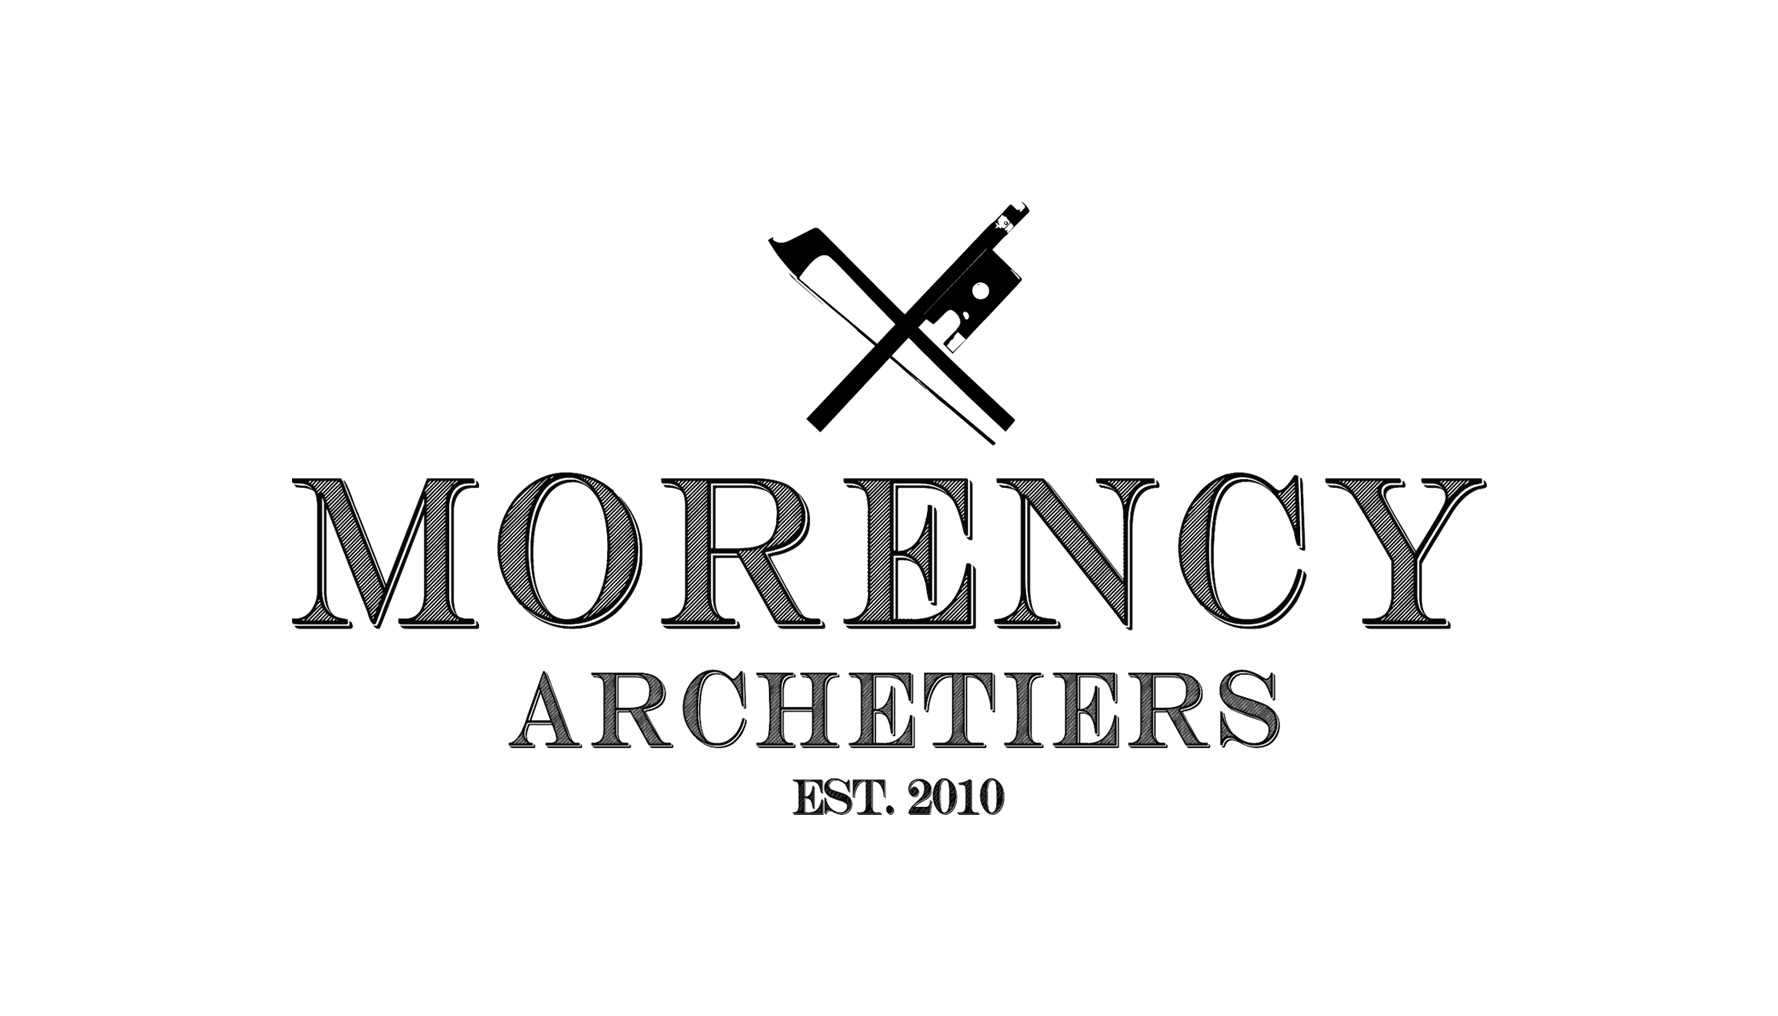 Archèterie R. Morency Inc